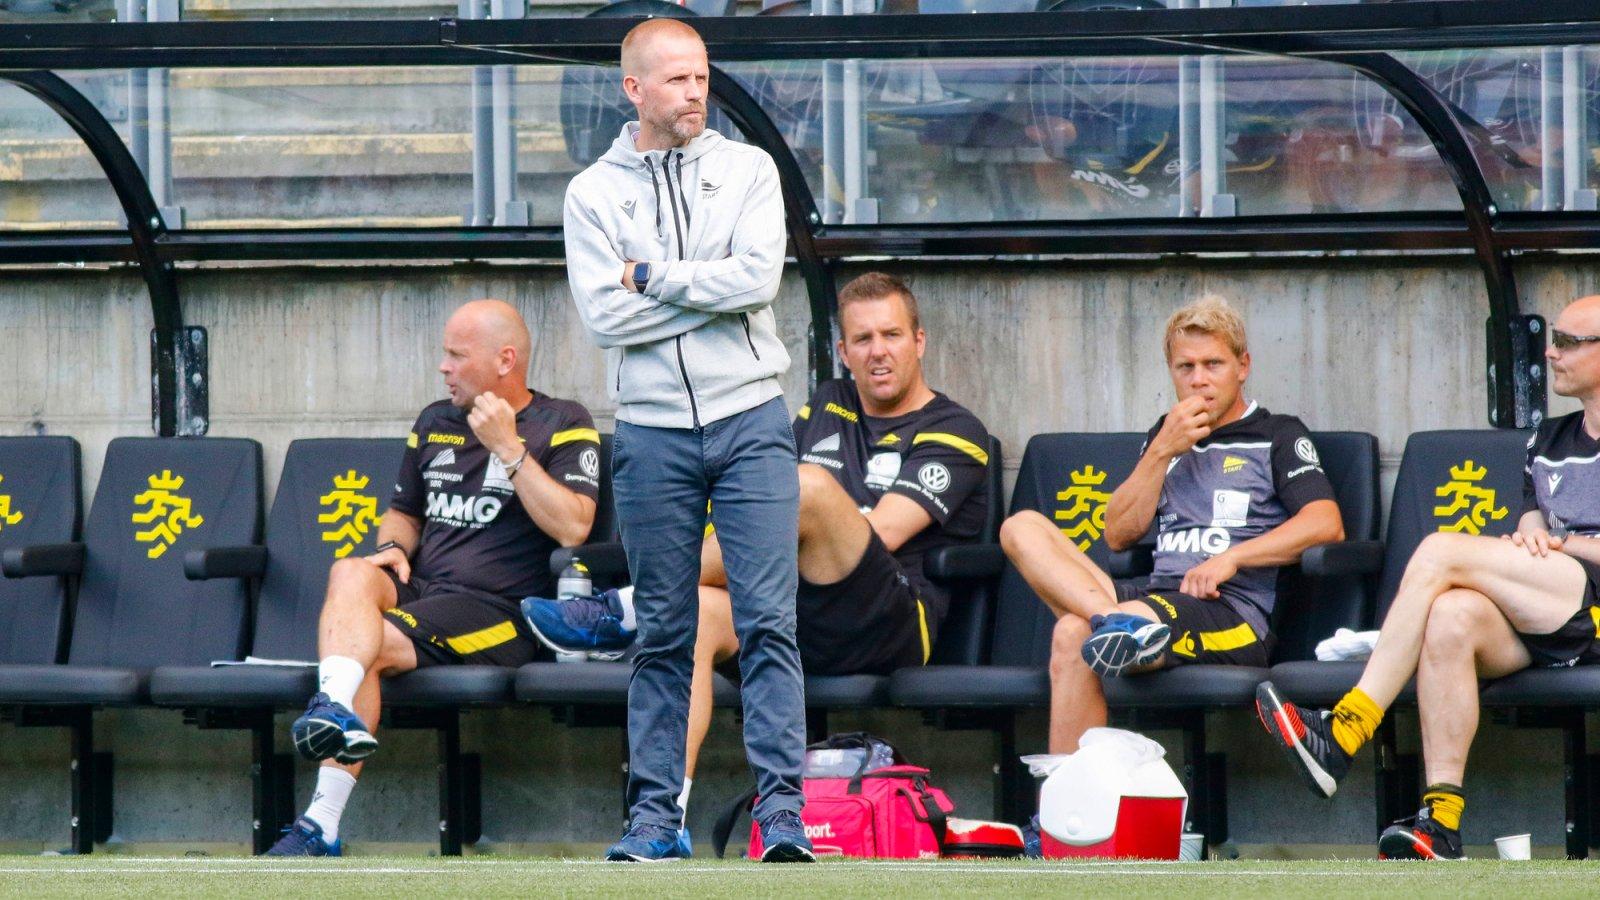 Joey Hardarson under årets første Eliteserie-kamp på Sparebanken Sør Arena. Foto: Tor Erik Schrøder / NTB scanpix